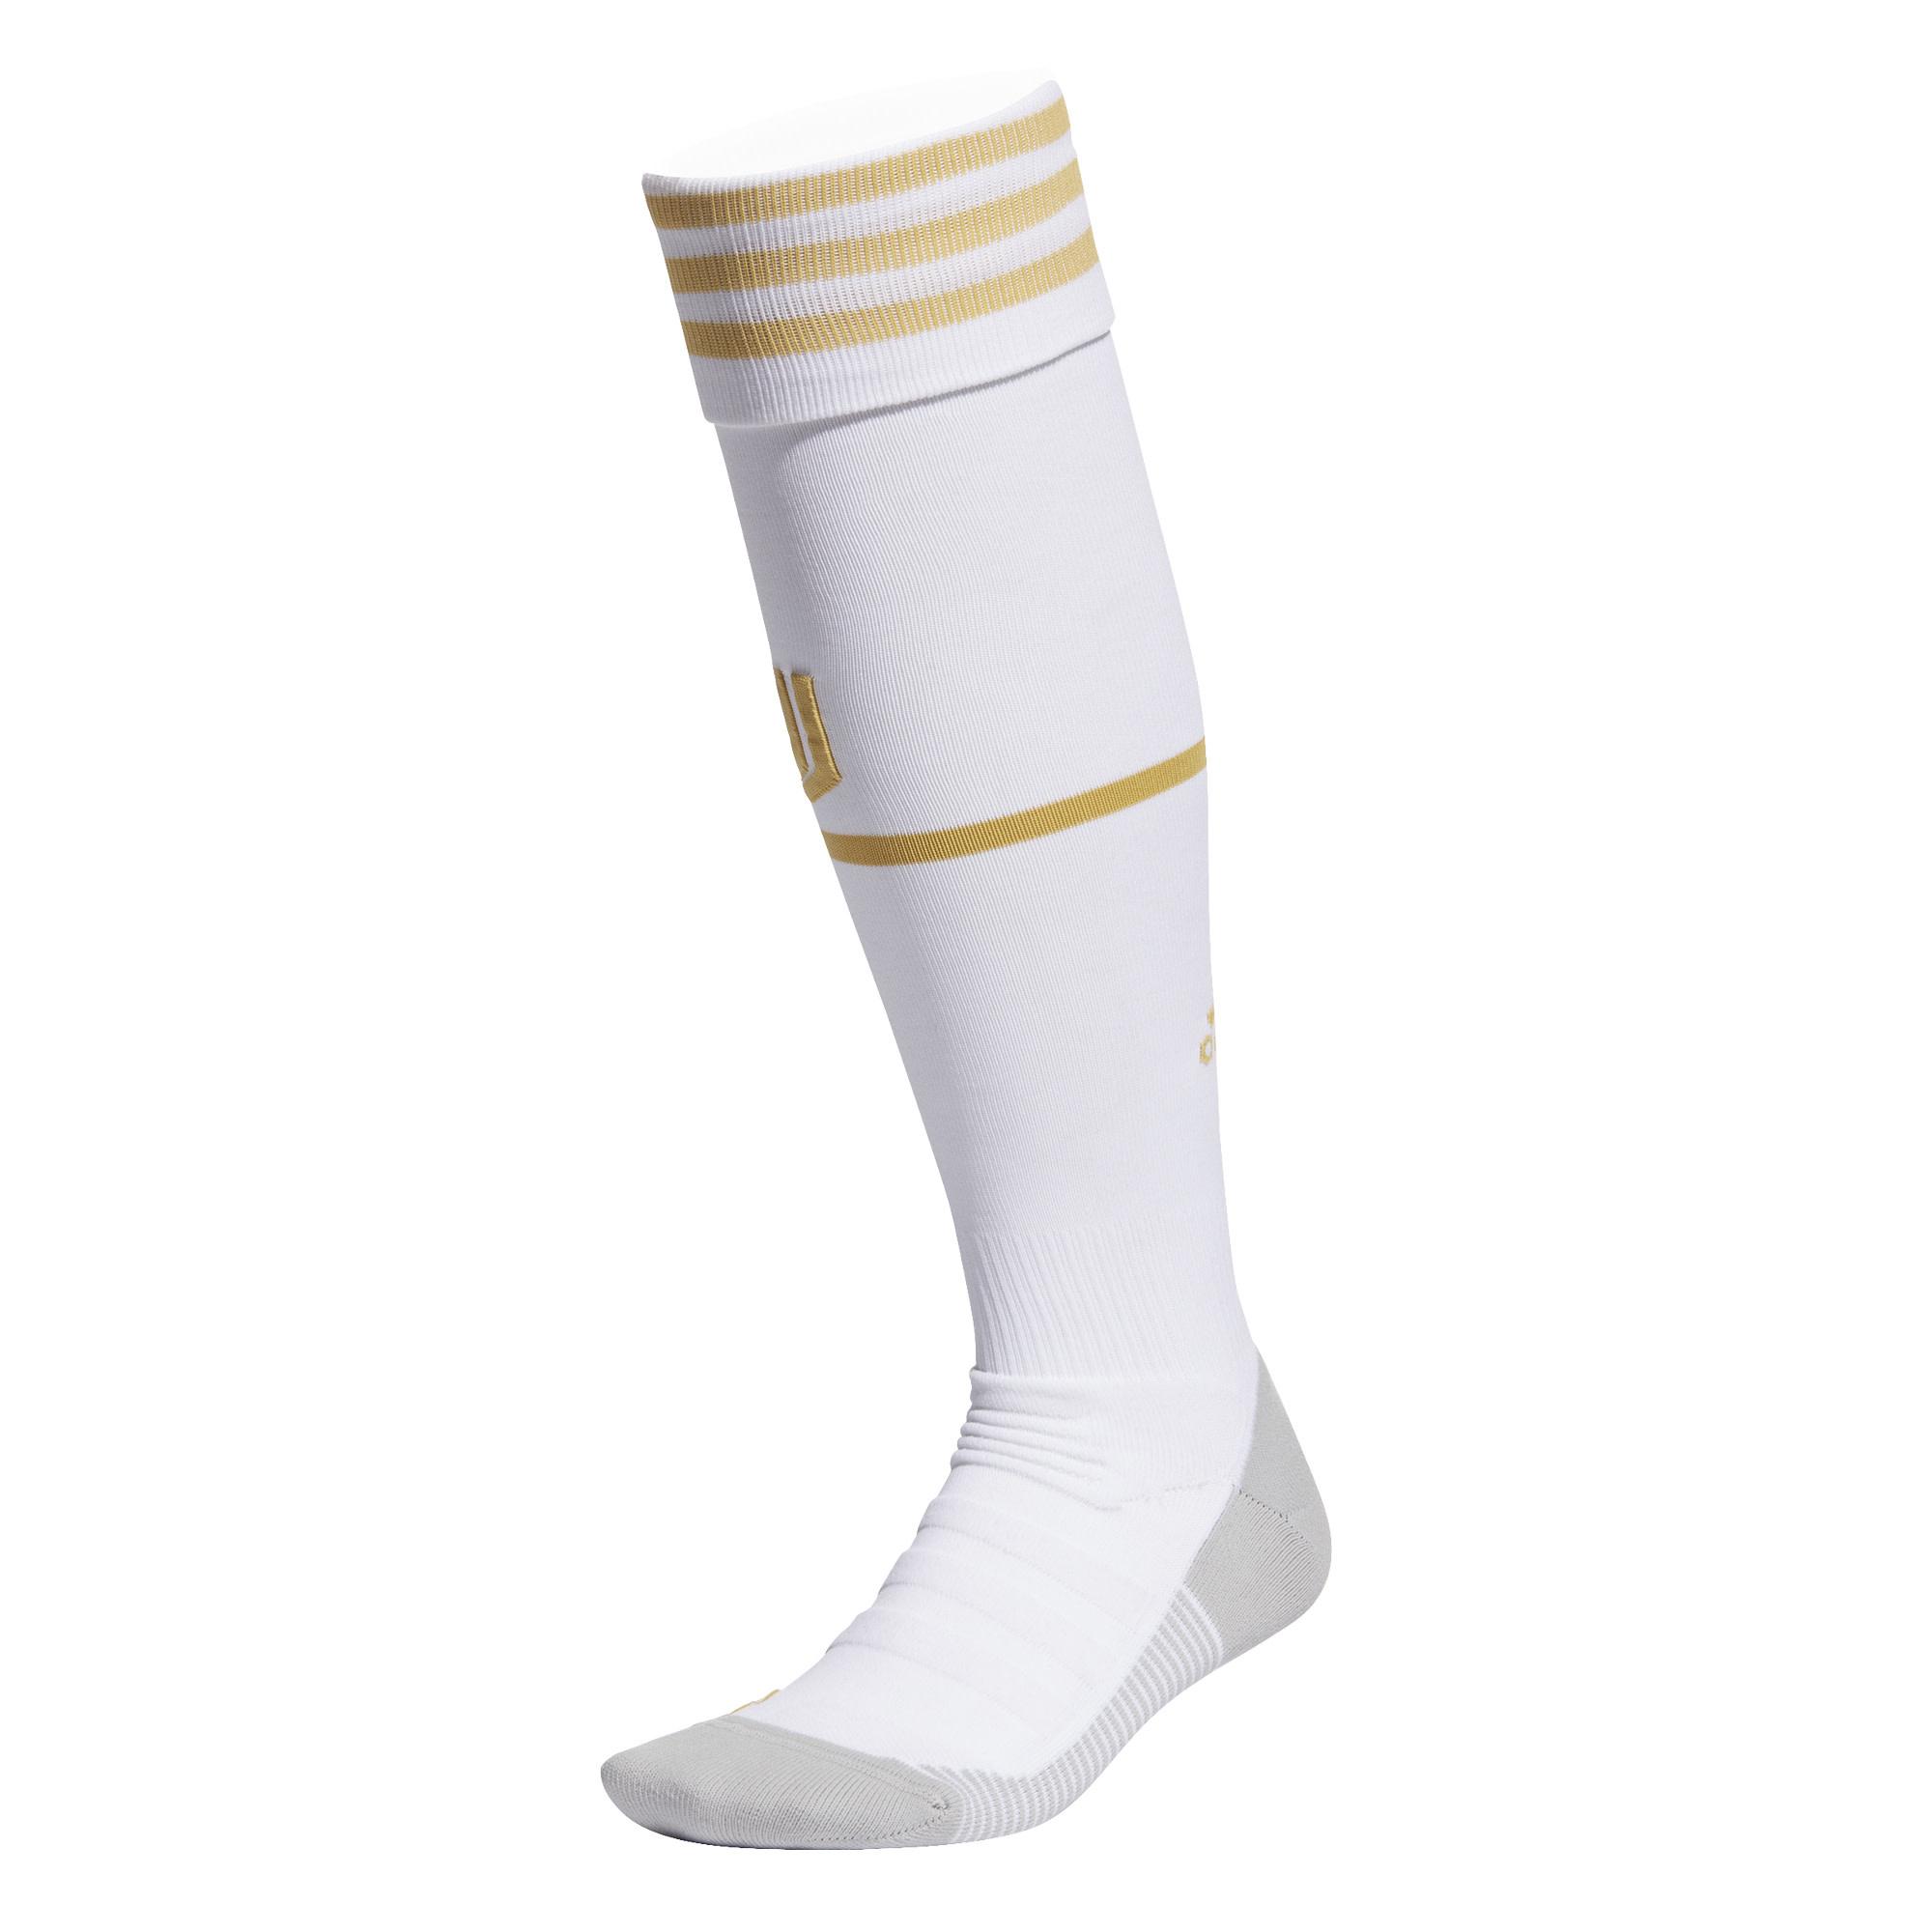 Adidas ADIDAS Juventus Home Sock '20-'21